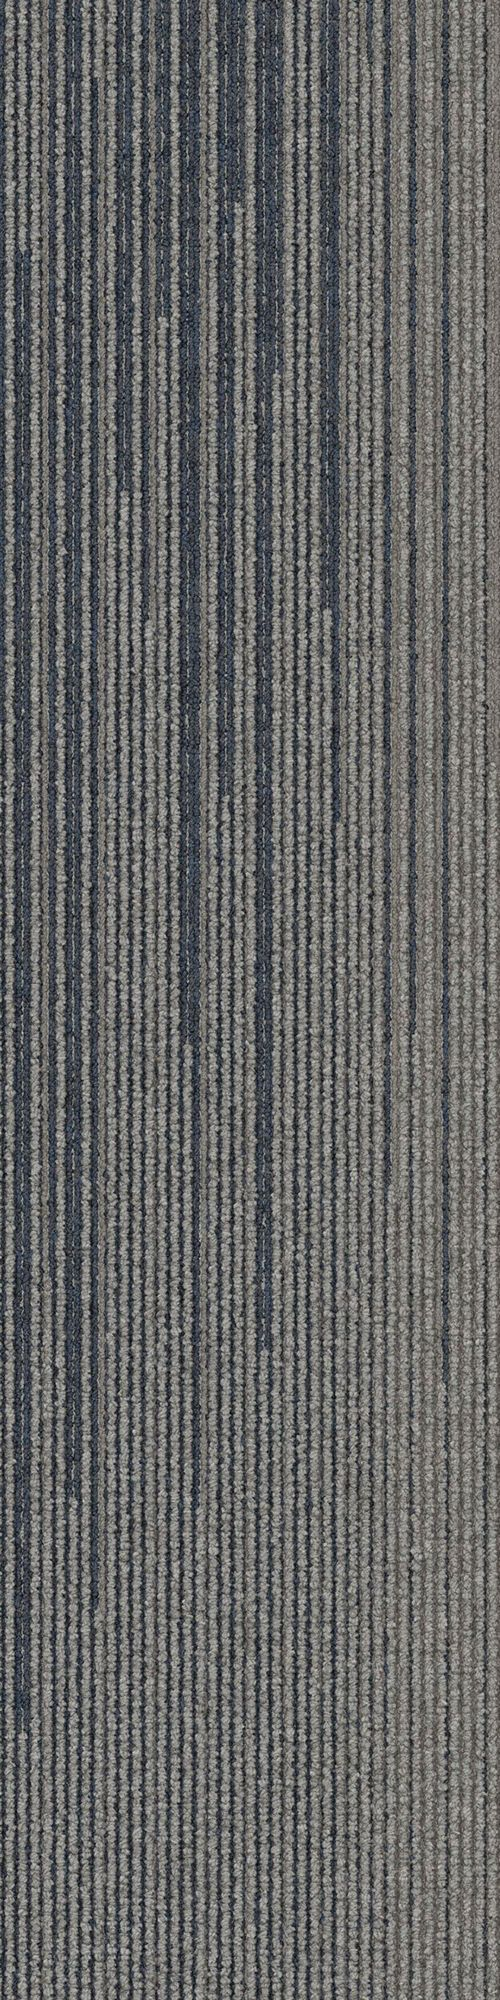 Interface carpet tile: SL930 Color name: Nickel Fade